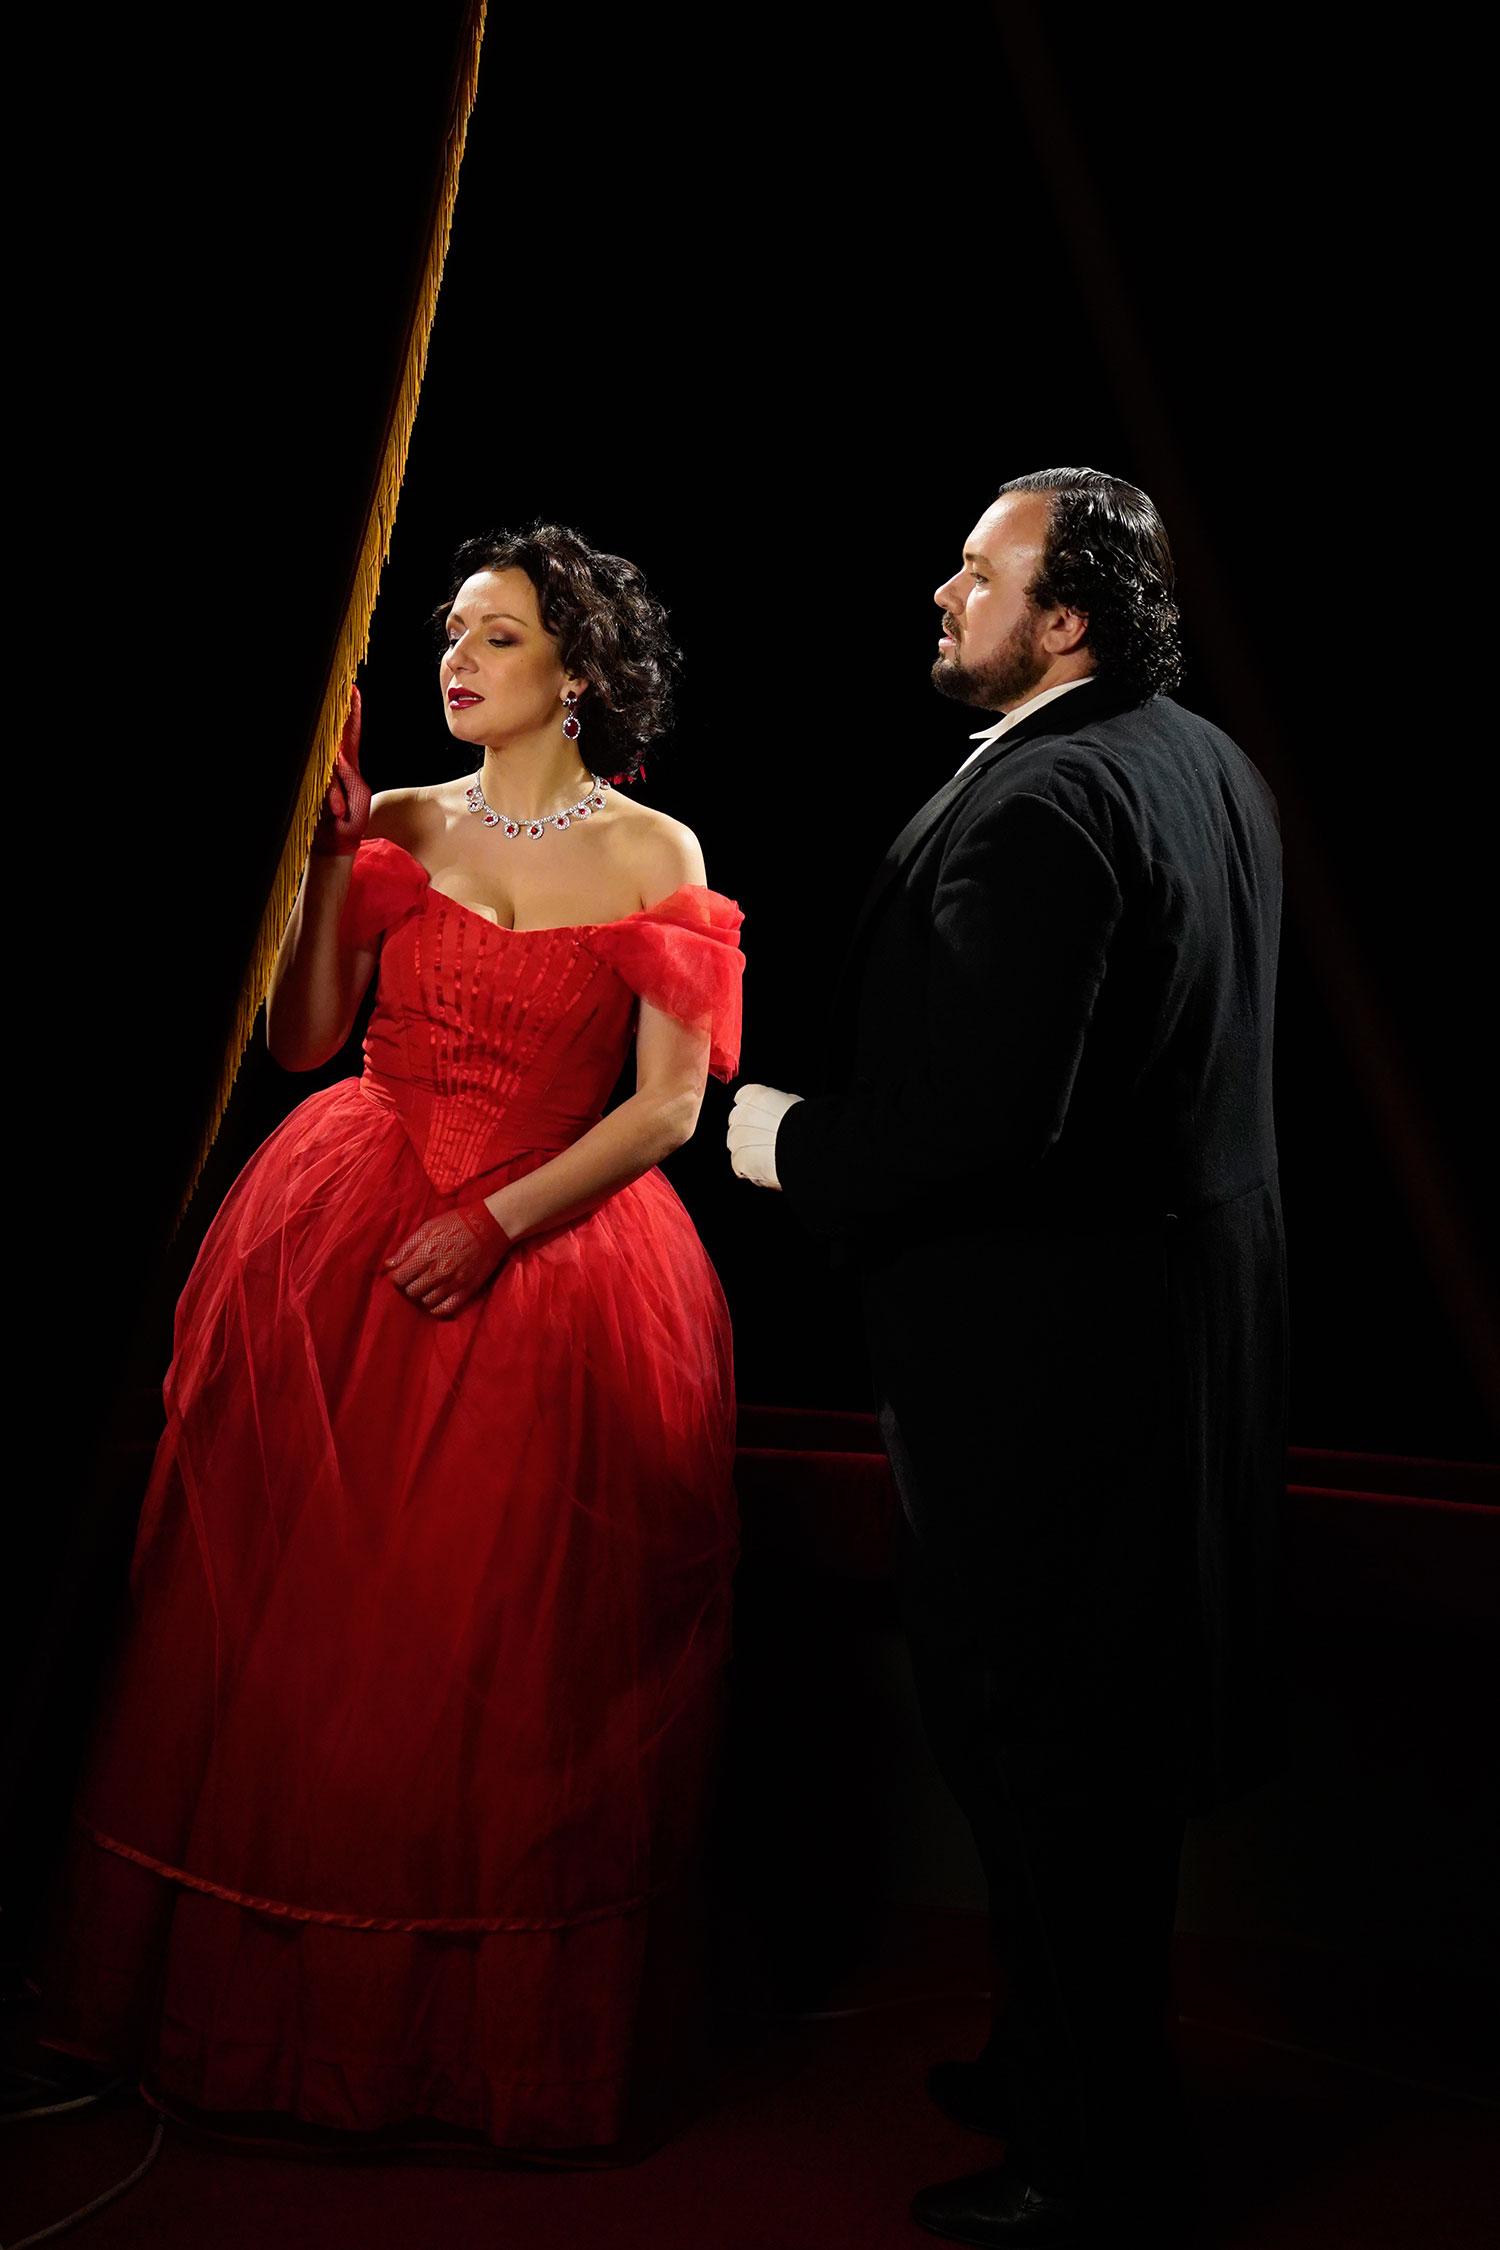 Stefan Pop con Irina Lungu - foto di Giacomo Orlando